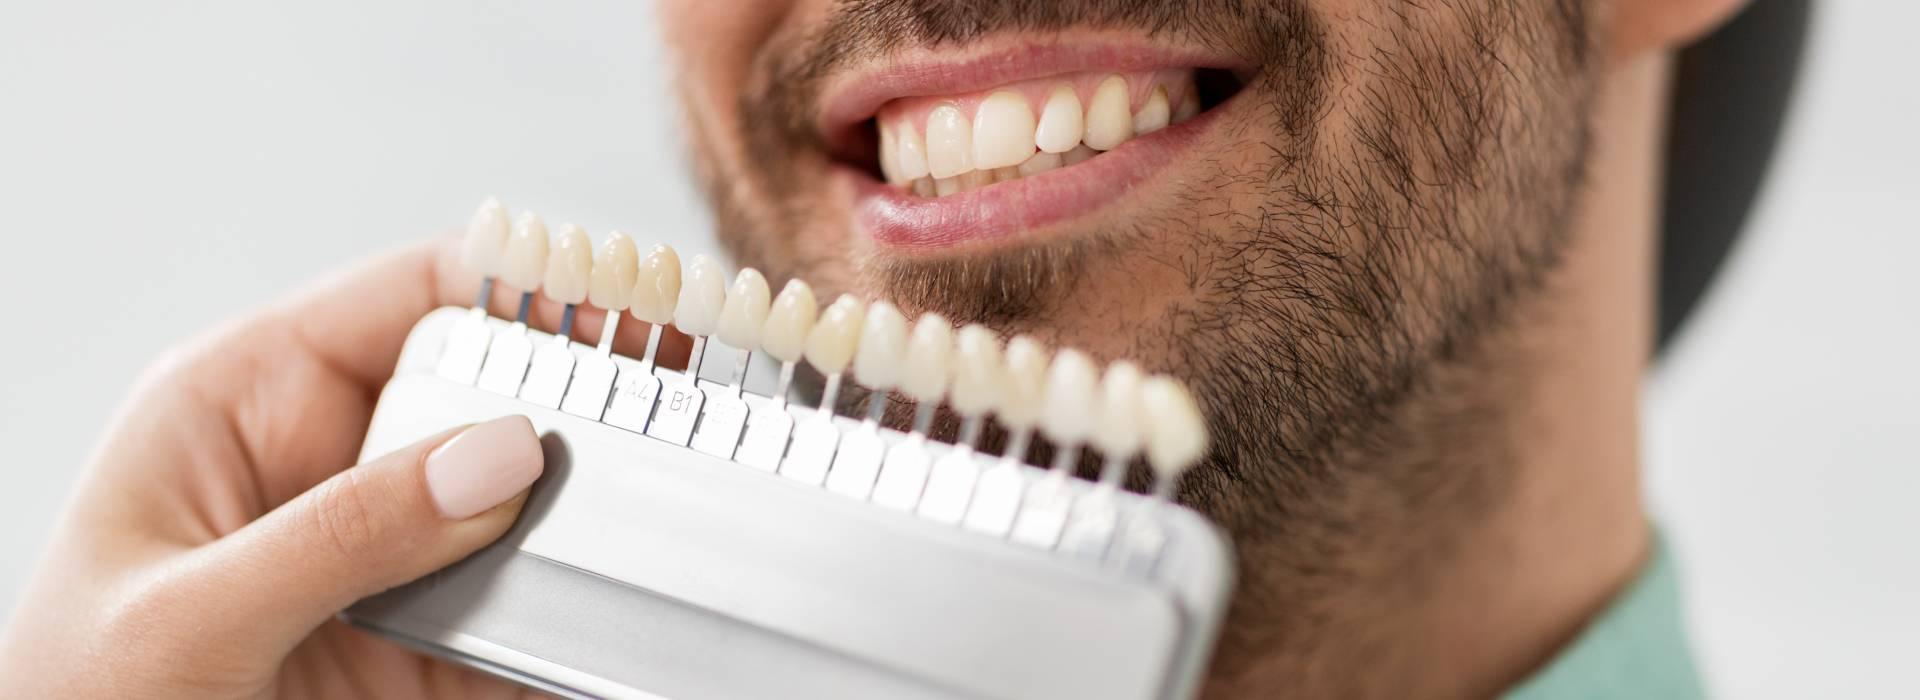 What Are Custom Teeth Whitening Trays